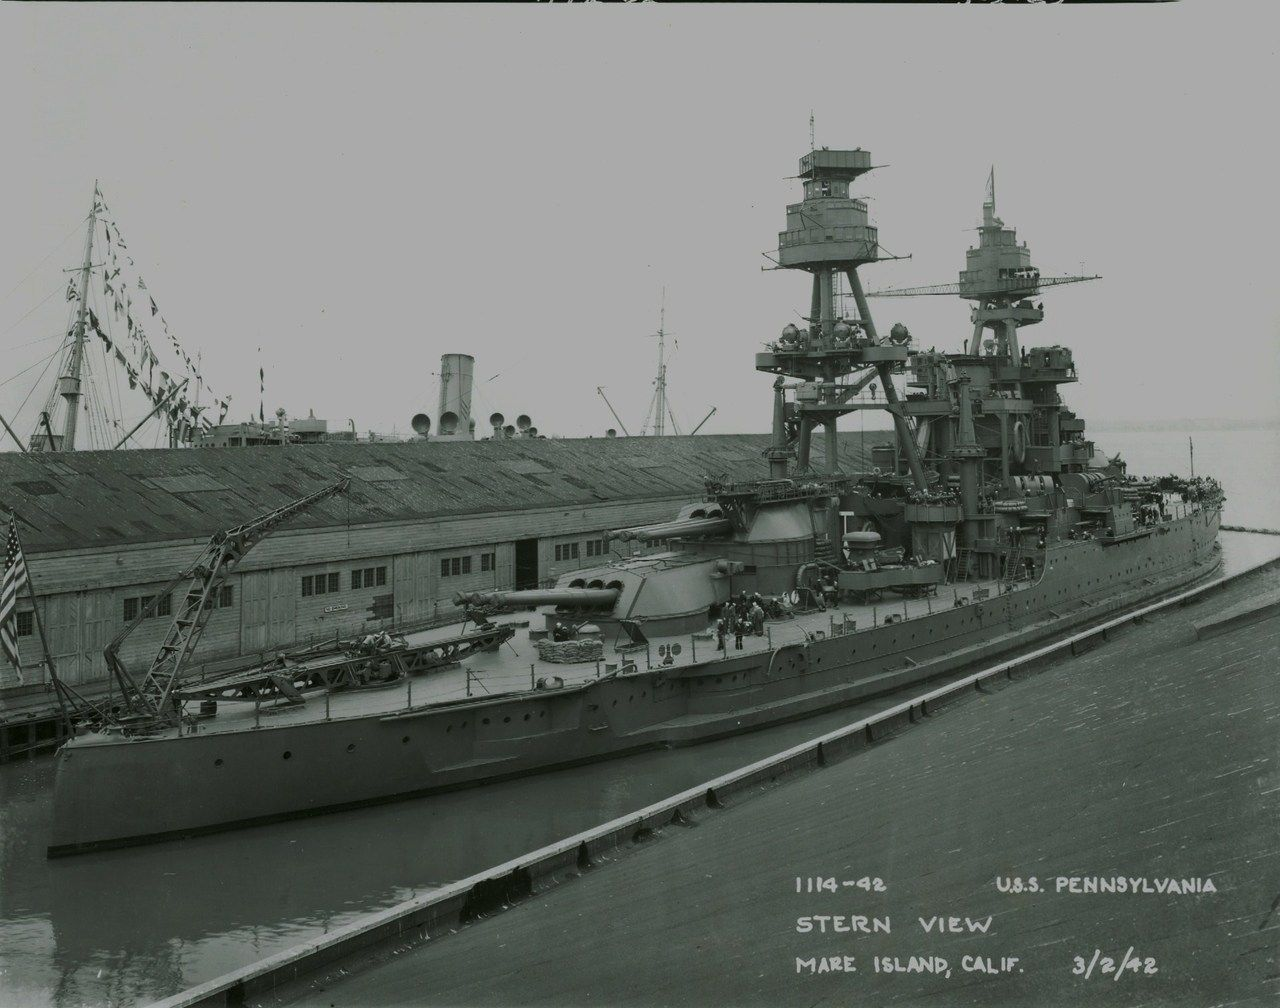 USS Pennsylvania after modernization.